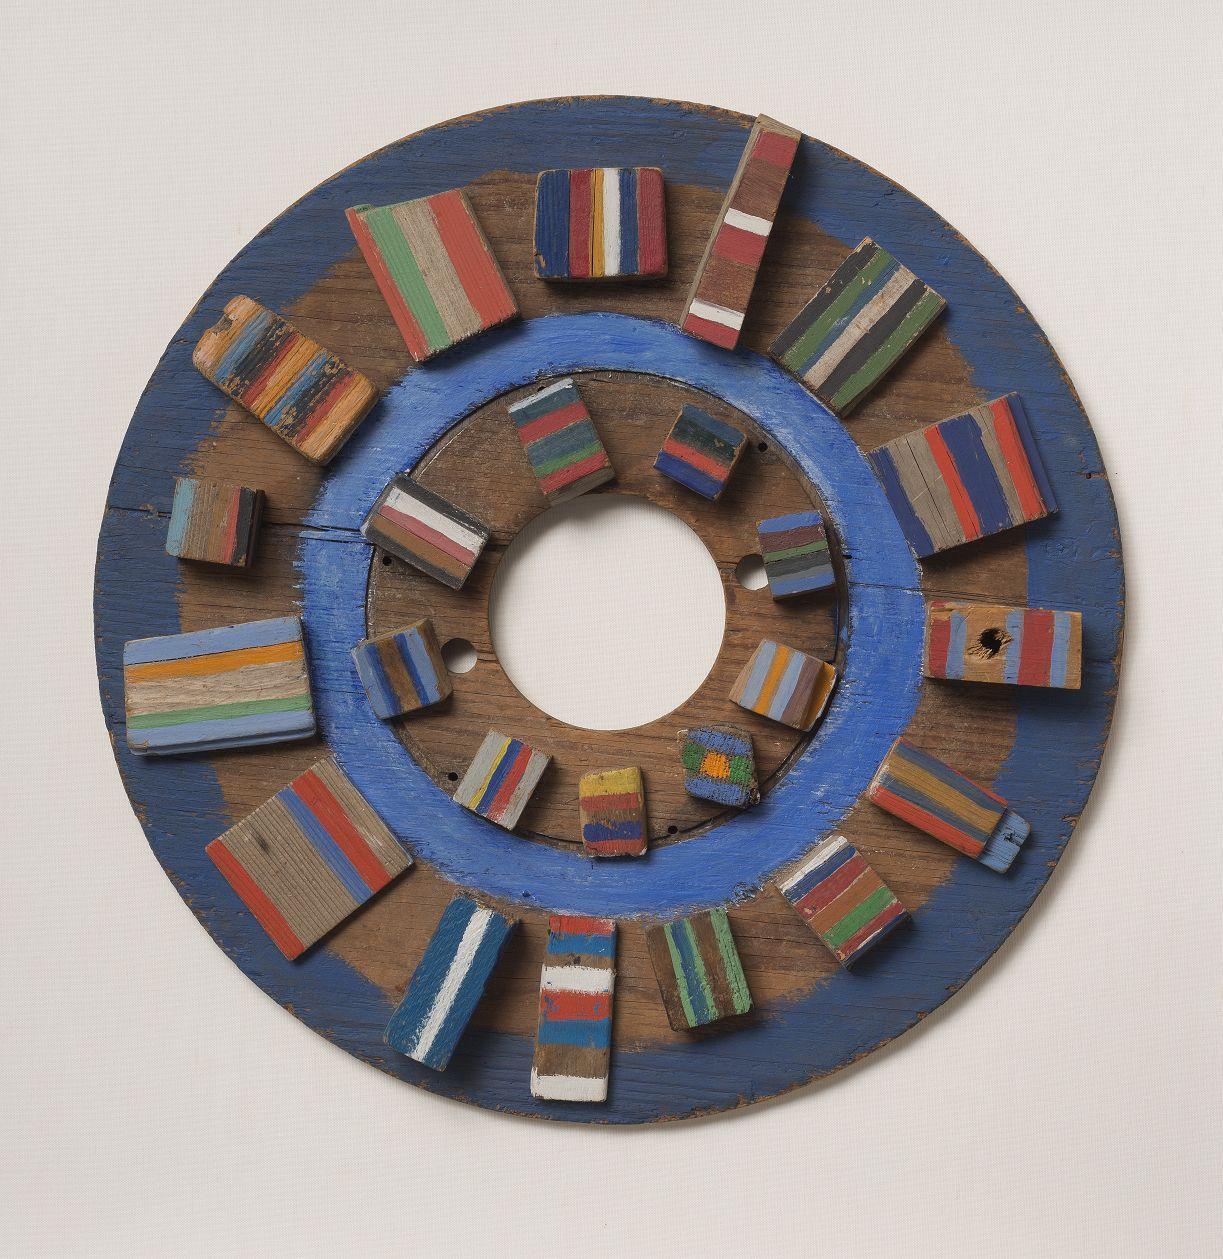 Wheel of Fun, 1970, Acrylic on wood